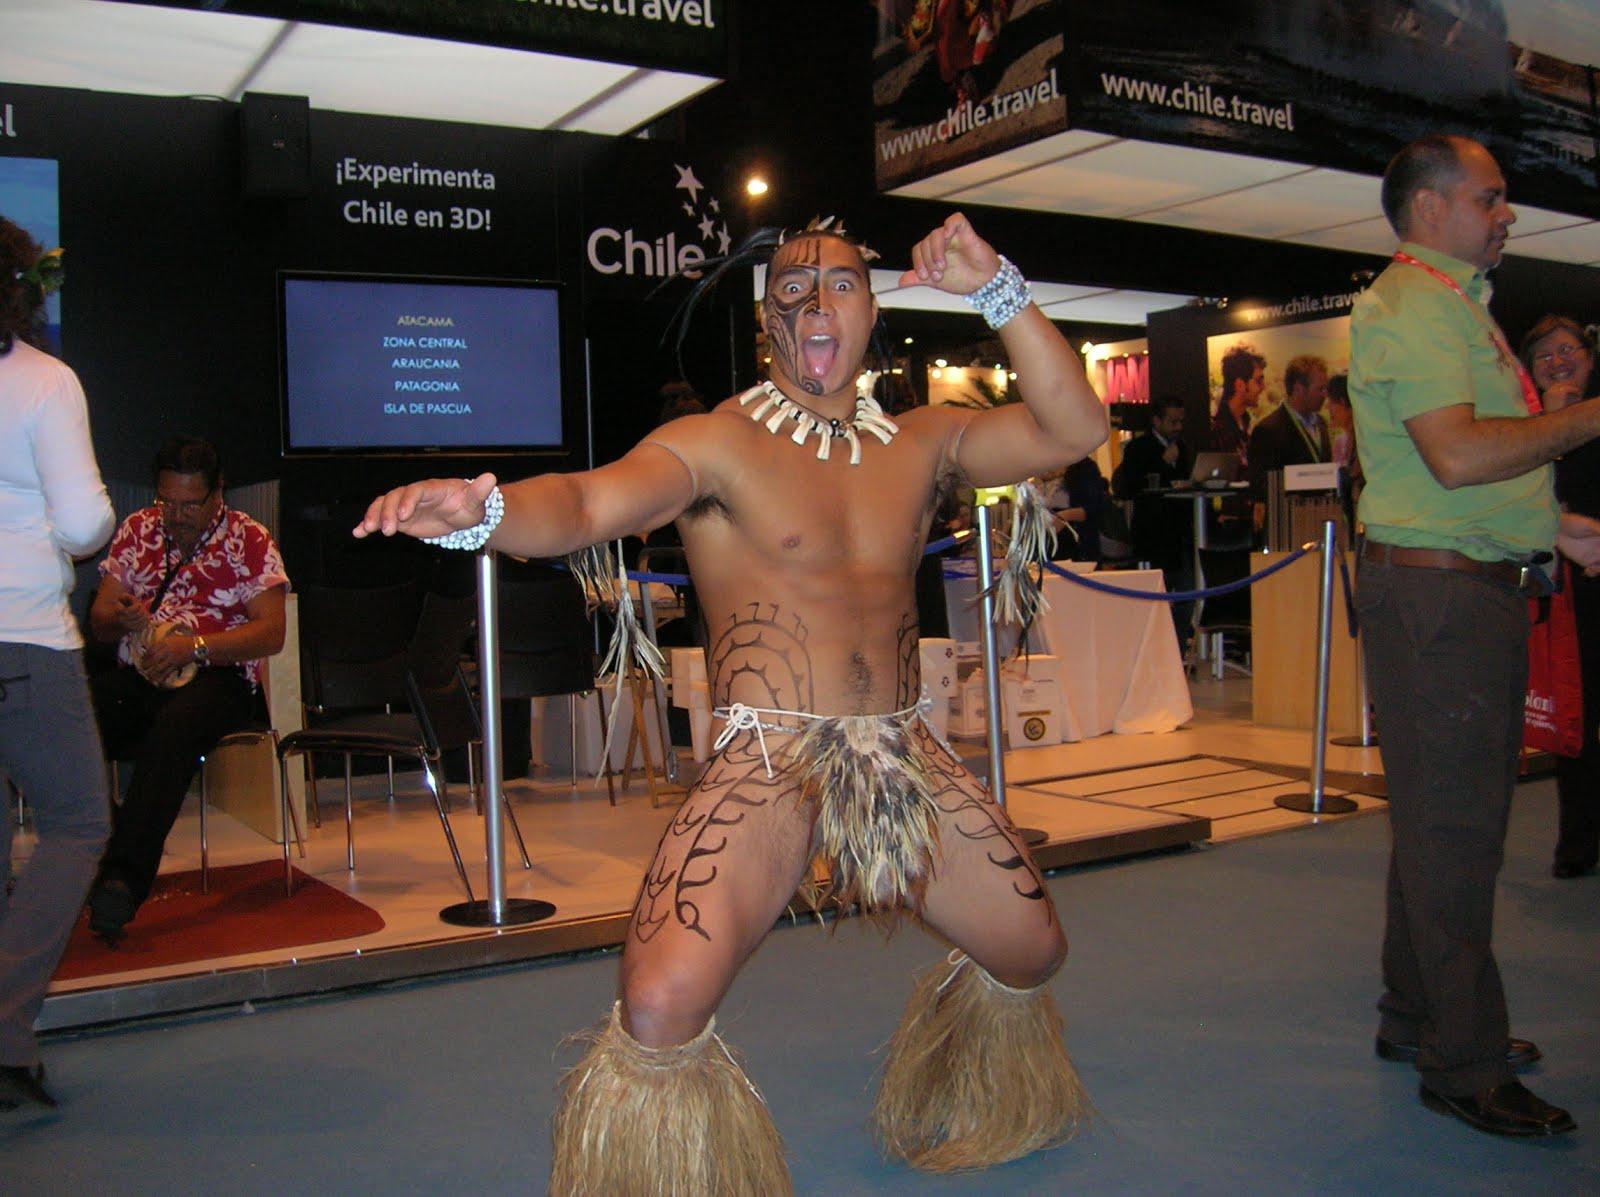 Fitur, Papa Nui, Isla de Pascua, Chile, vuelta al mundo, round the world, La vuelta al mundo de Asun y Ricardo